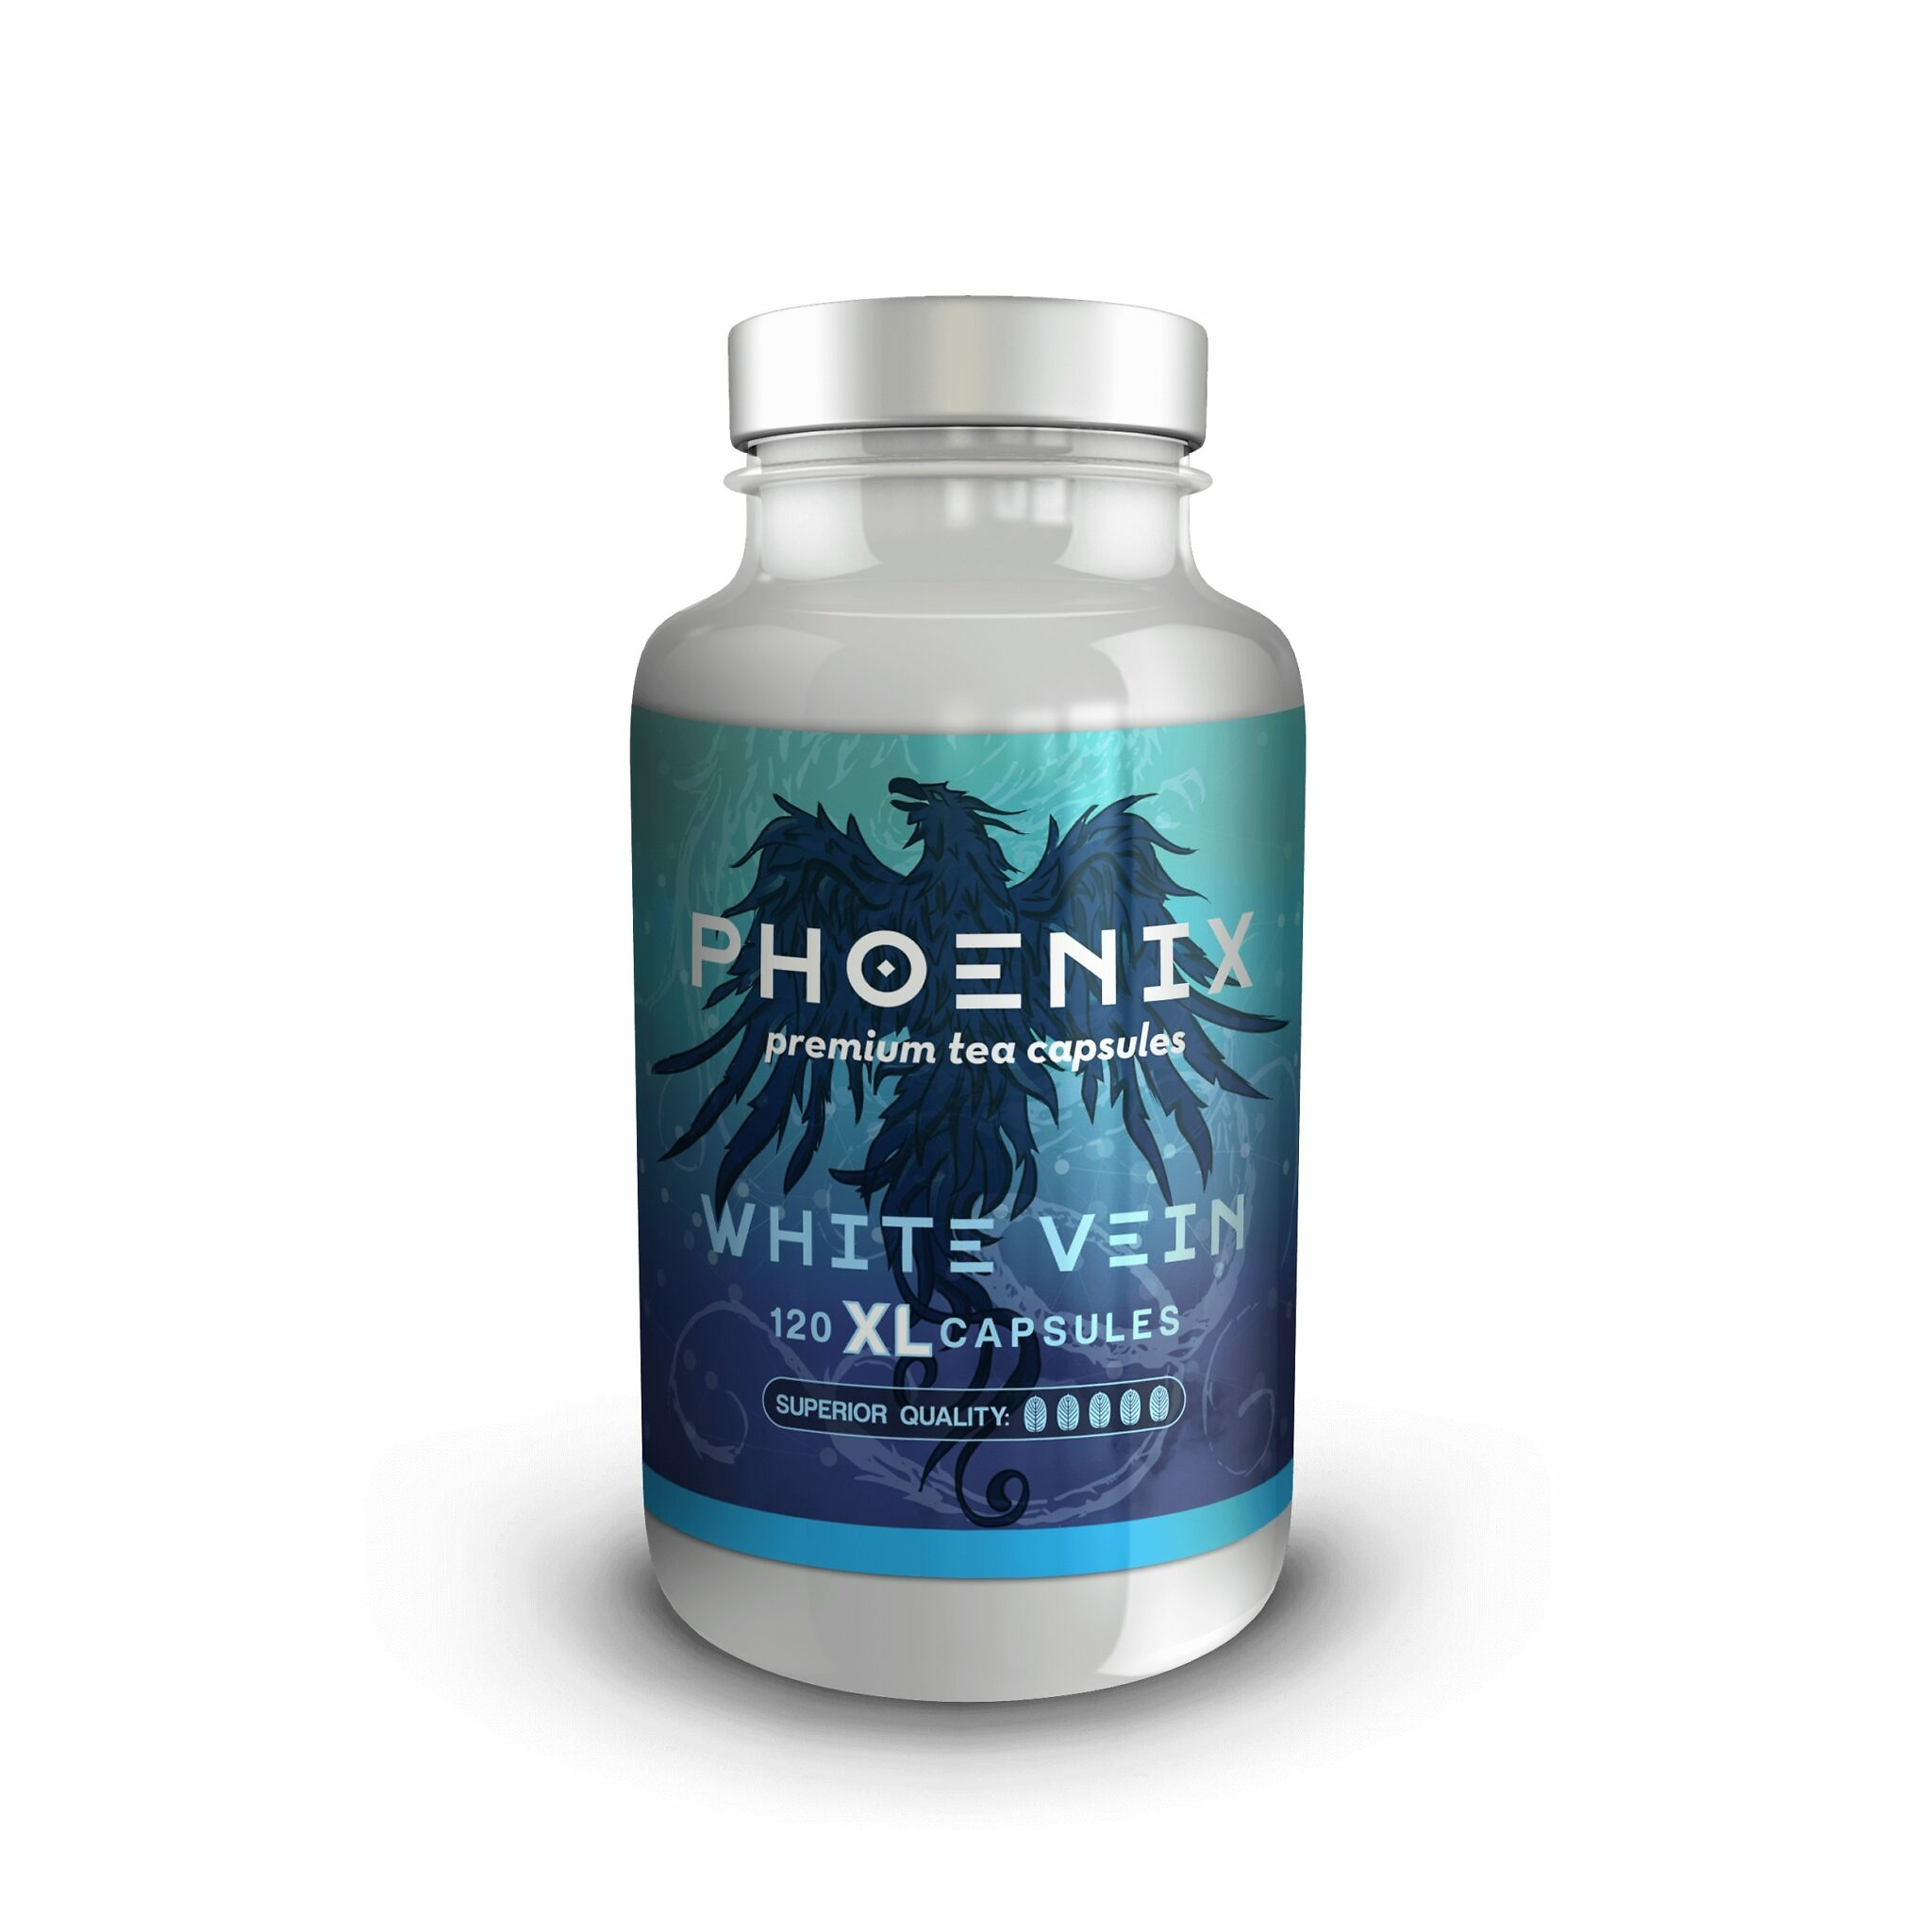 Phoenix White Vein Kratom XL Capsules 120 count bottle front